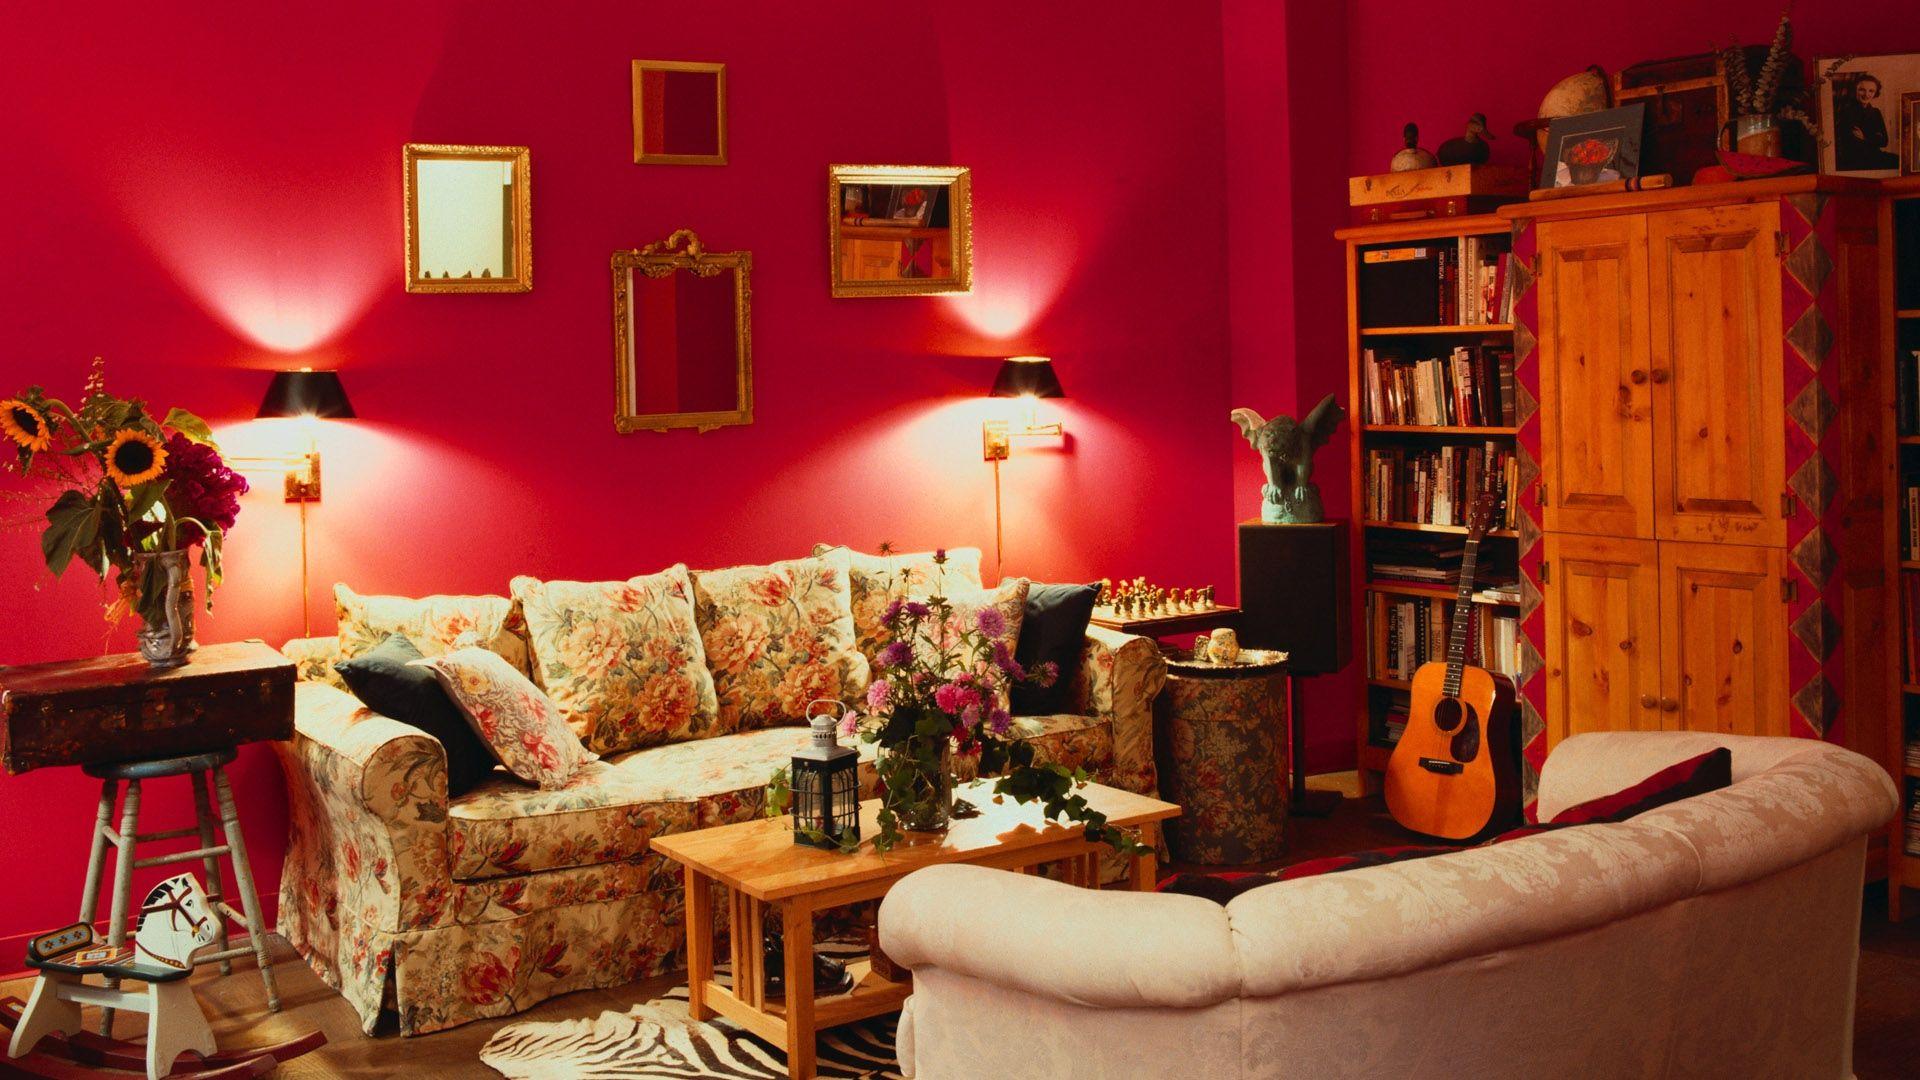 Download Wallpaper 1920x1080 Room Walls Furniture Interior Full Hd 1080p Hd Background